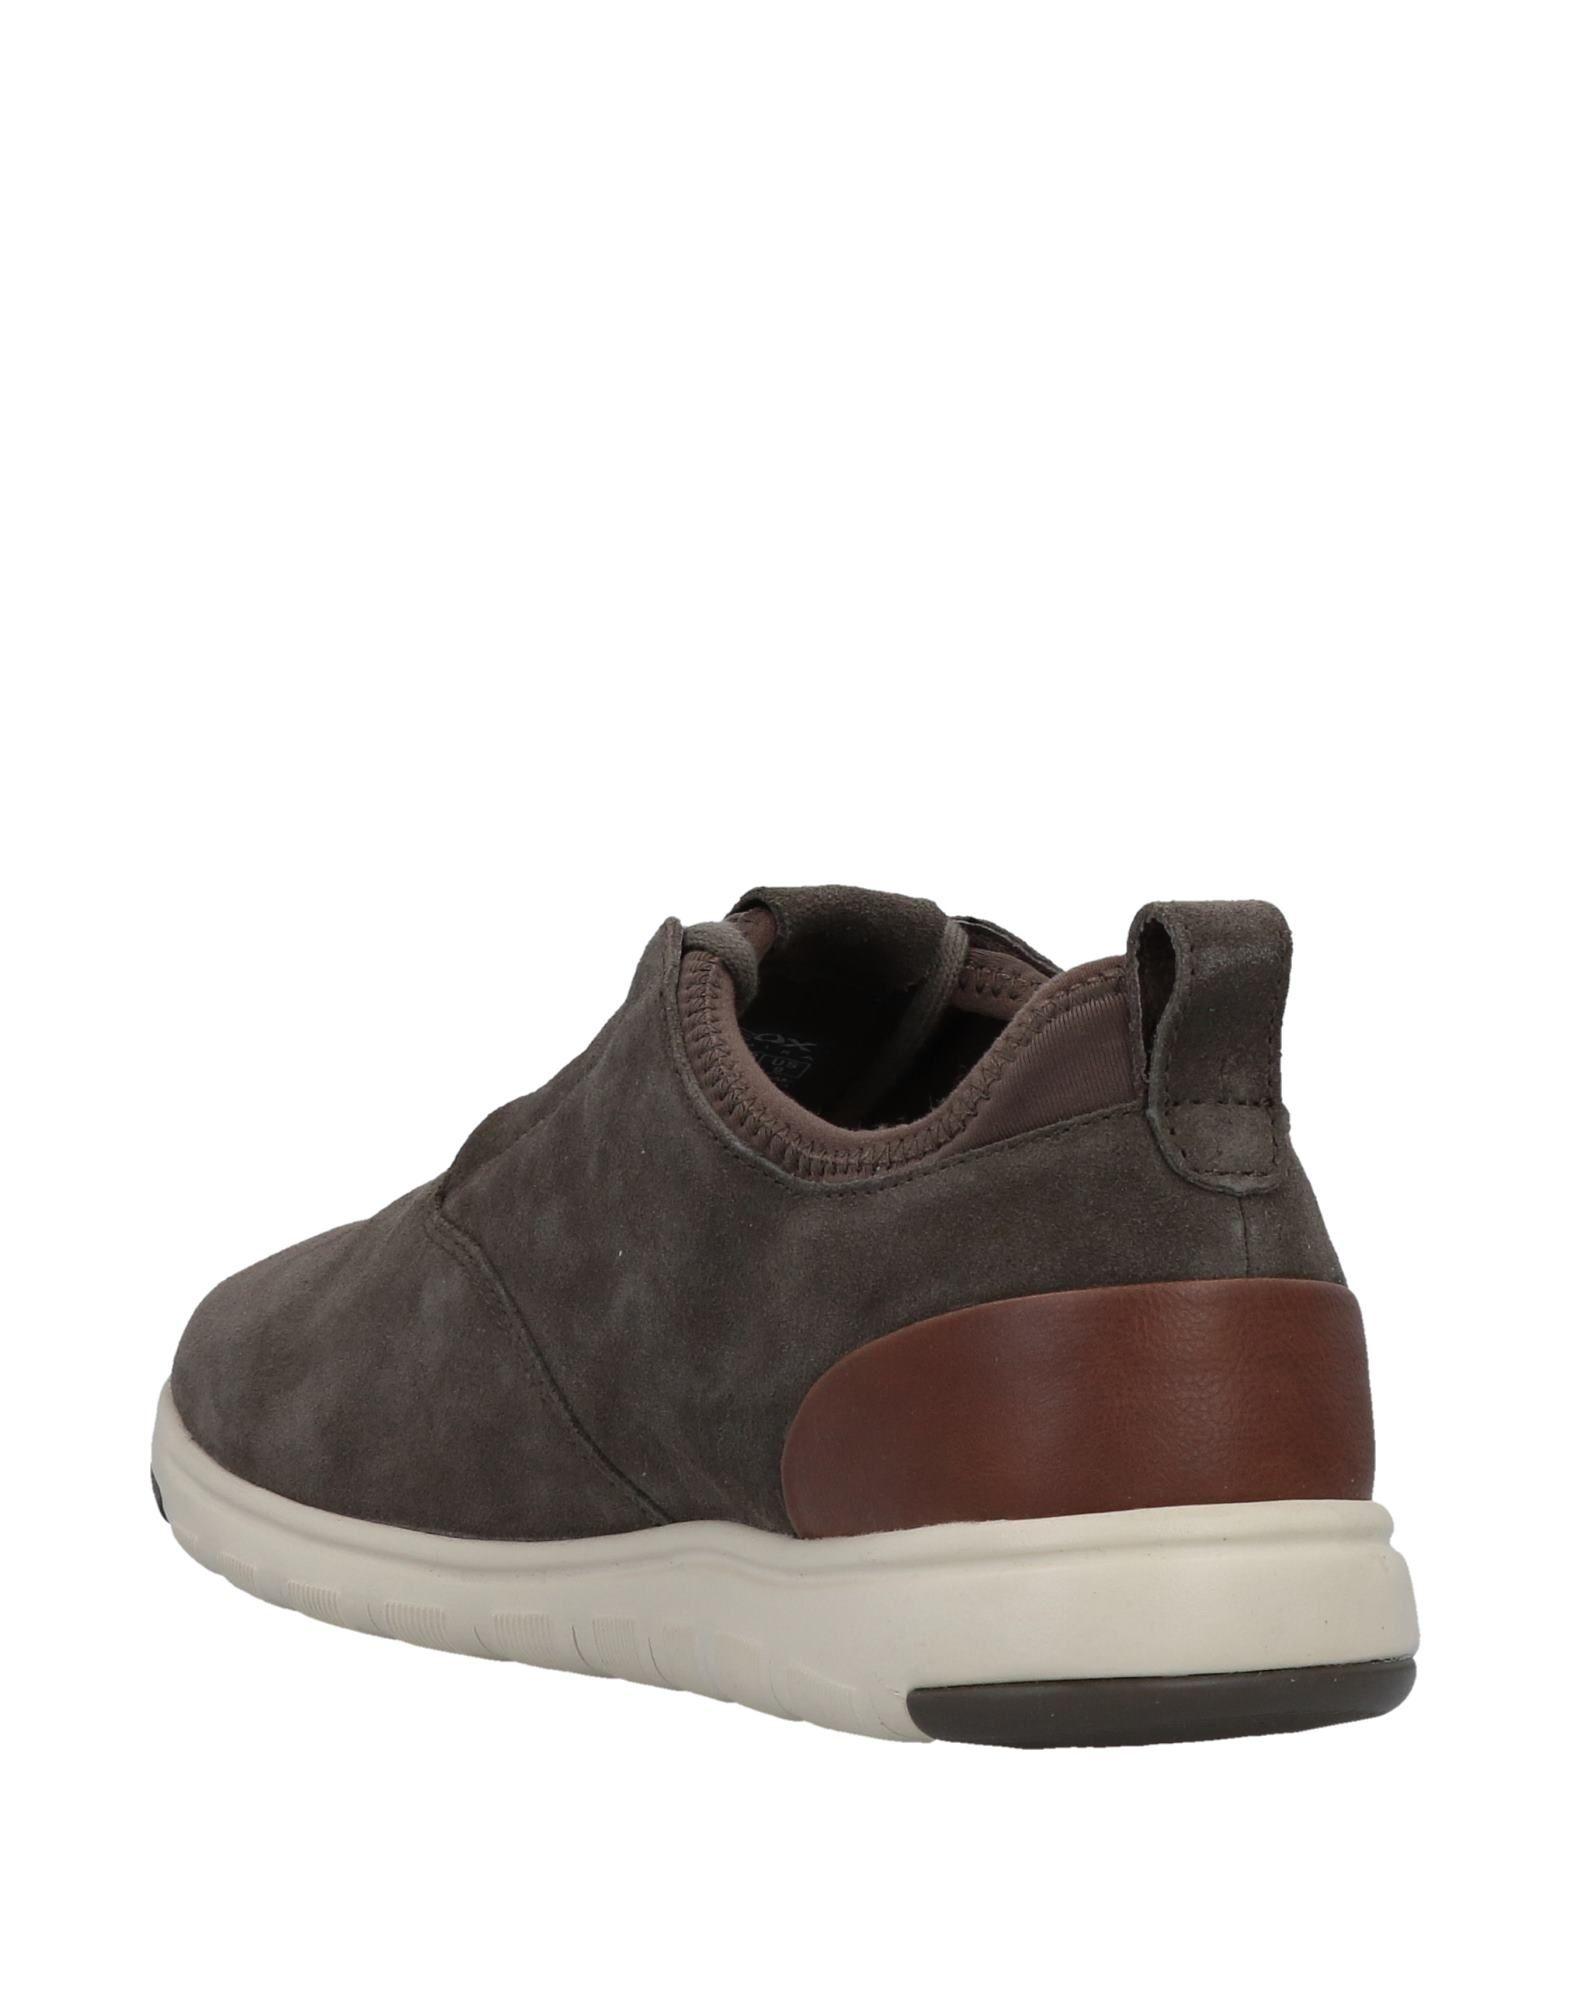 Geox Heiße Sneakers Herren  11500666PV Heiße Geox Schuhe 3c47c1